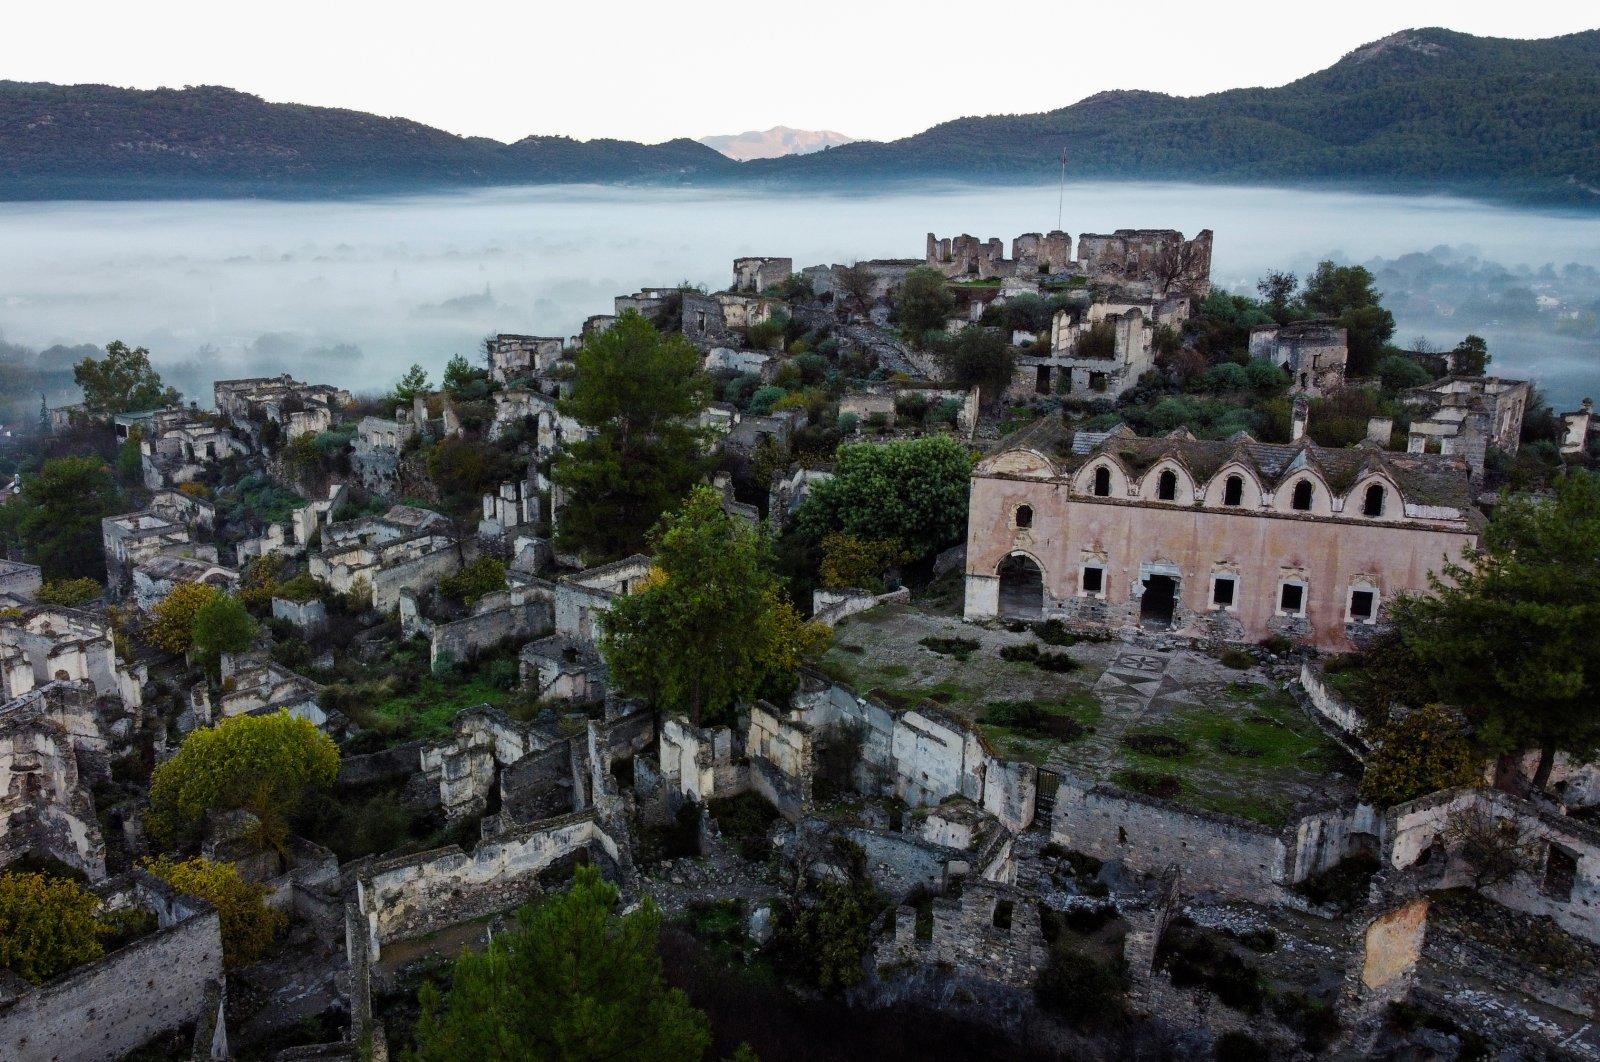 Abandoned buildings are seen through the fog in Kayaköy, Muğla province, Dec. 11, 2020. (AA Photo)